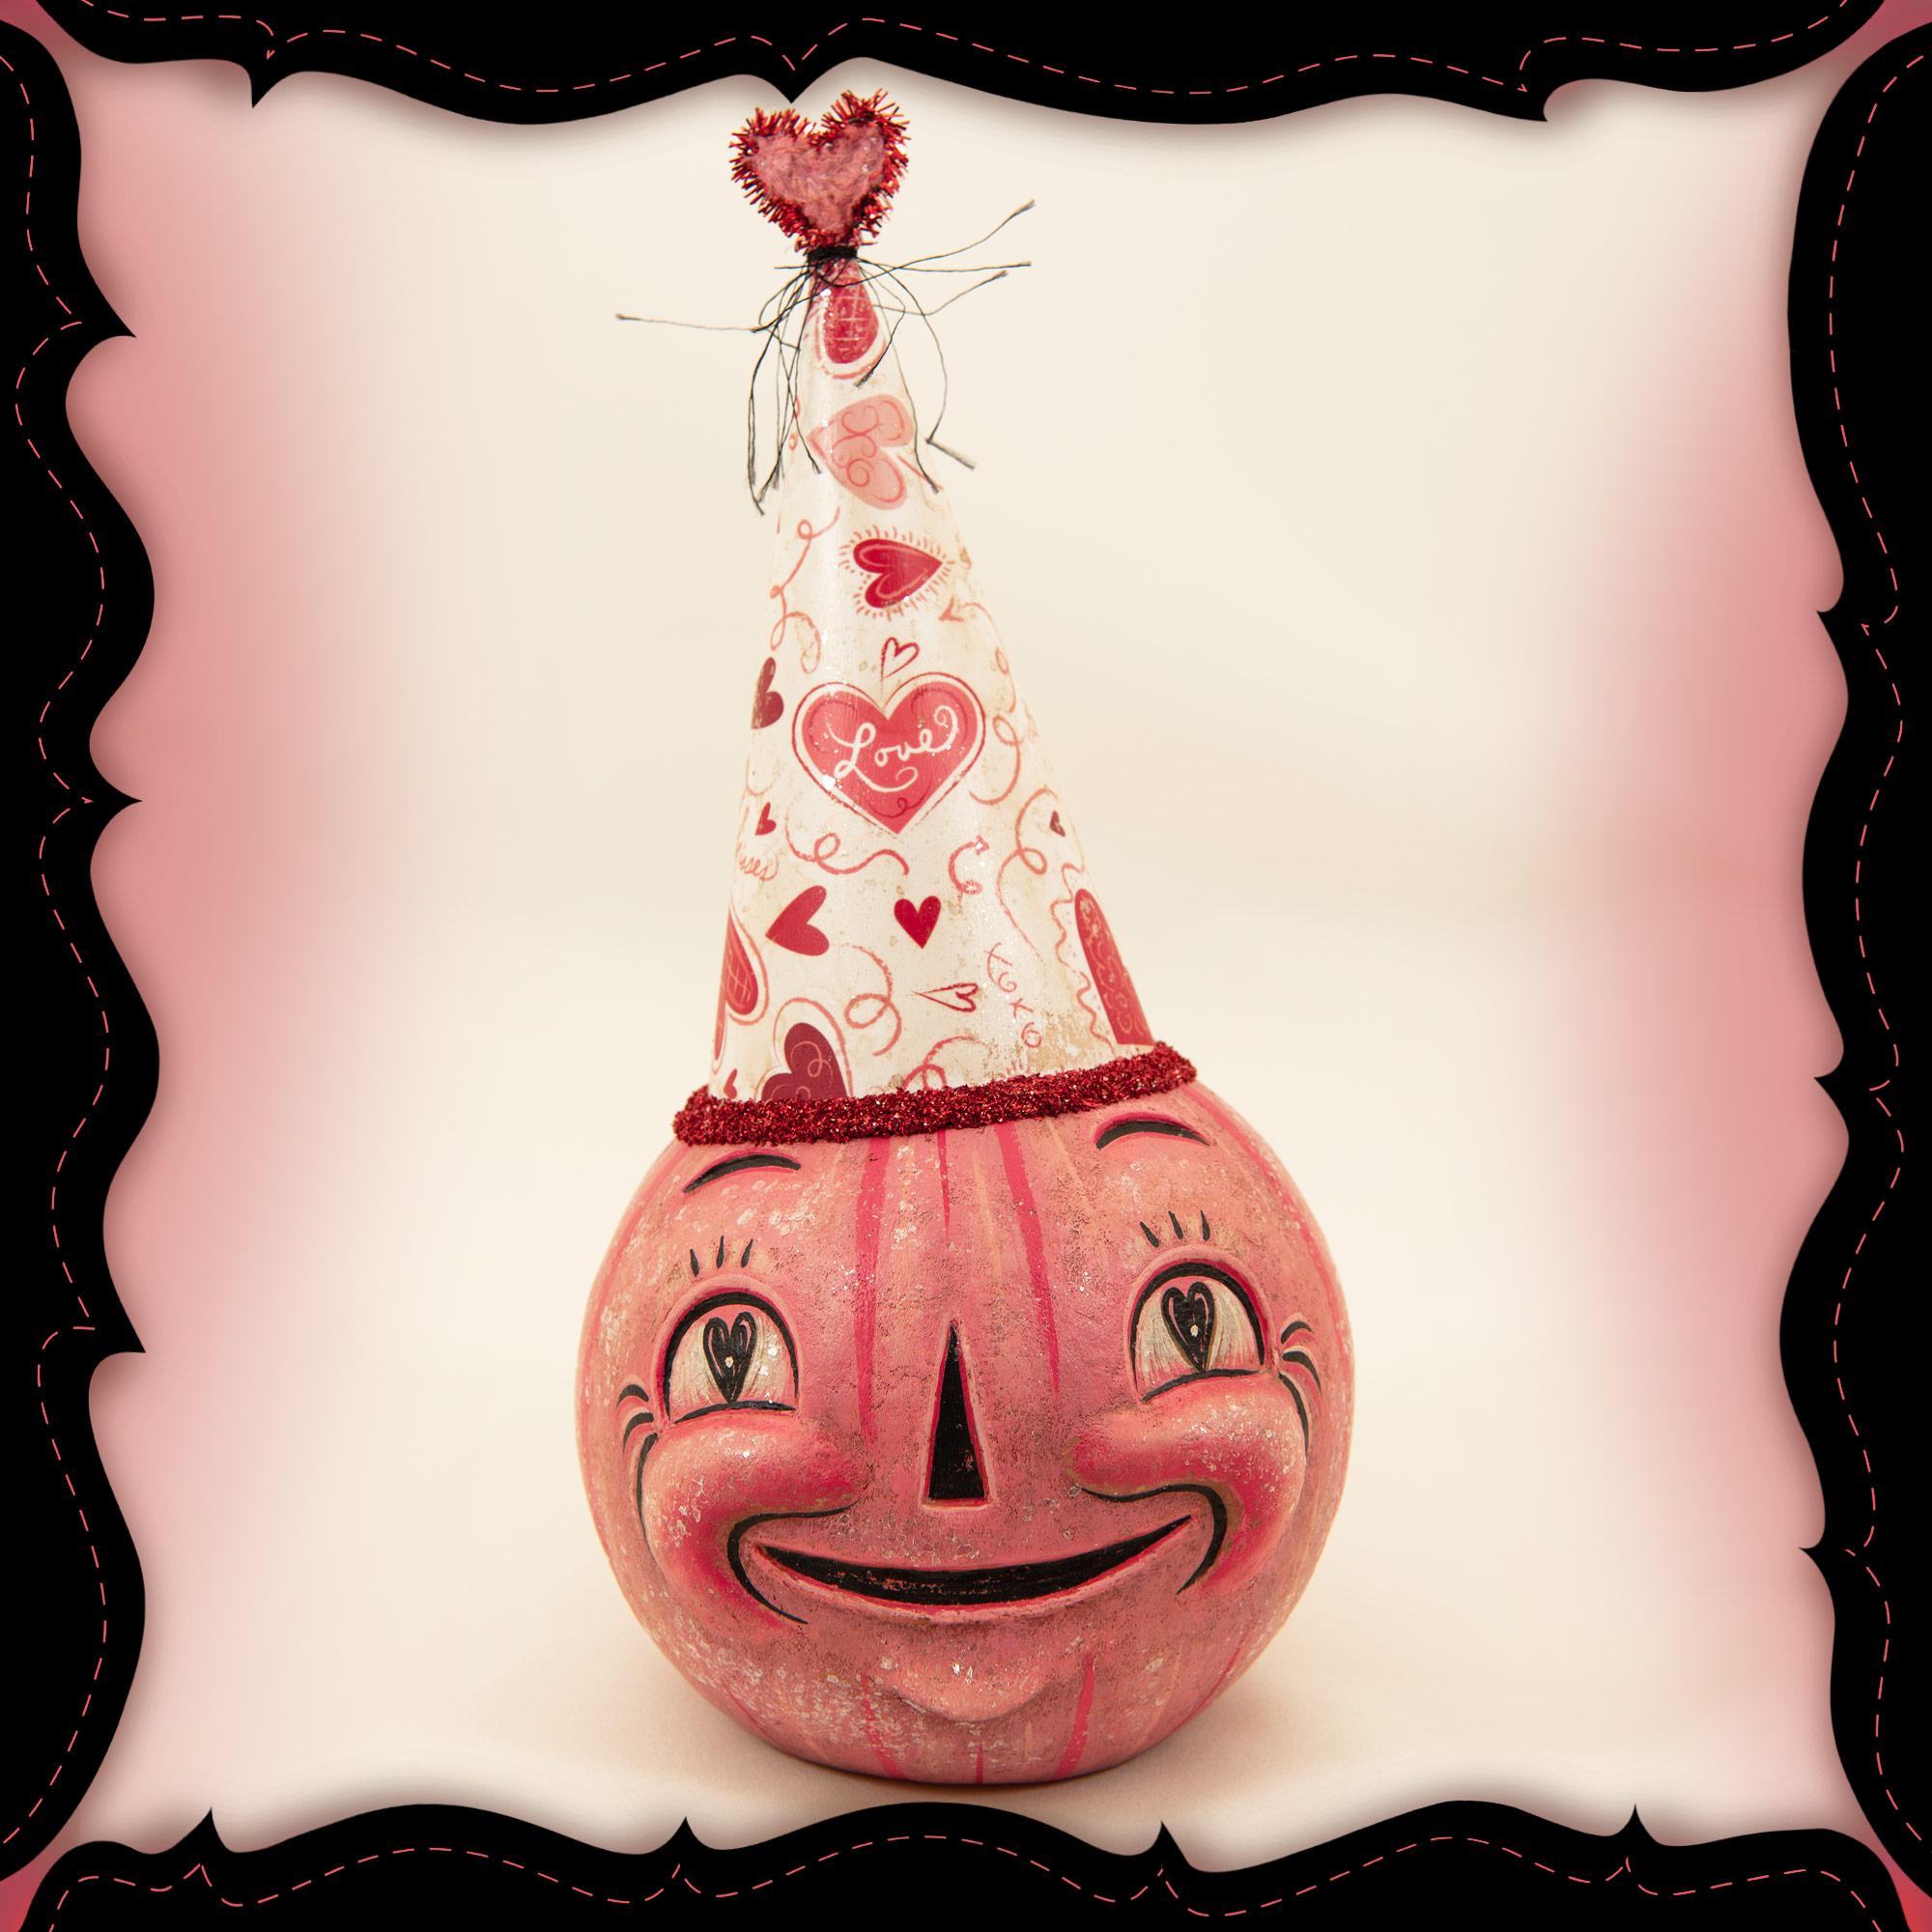 Johanna-Parker-Blushing-Roberto-Valloween-Frame-pink.jpg